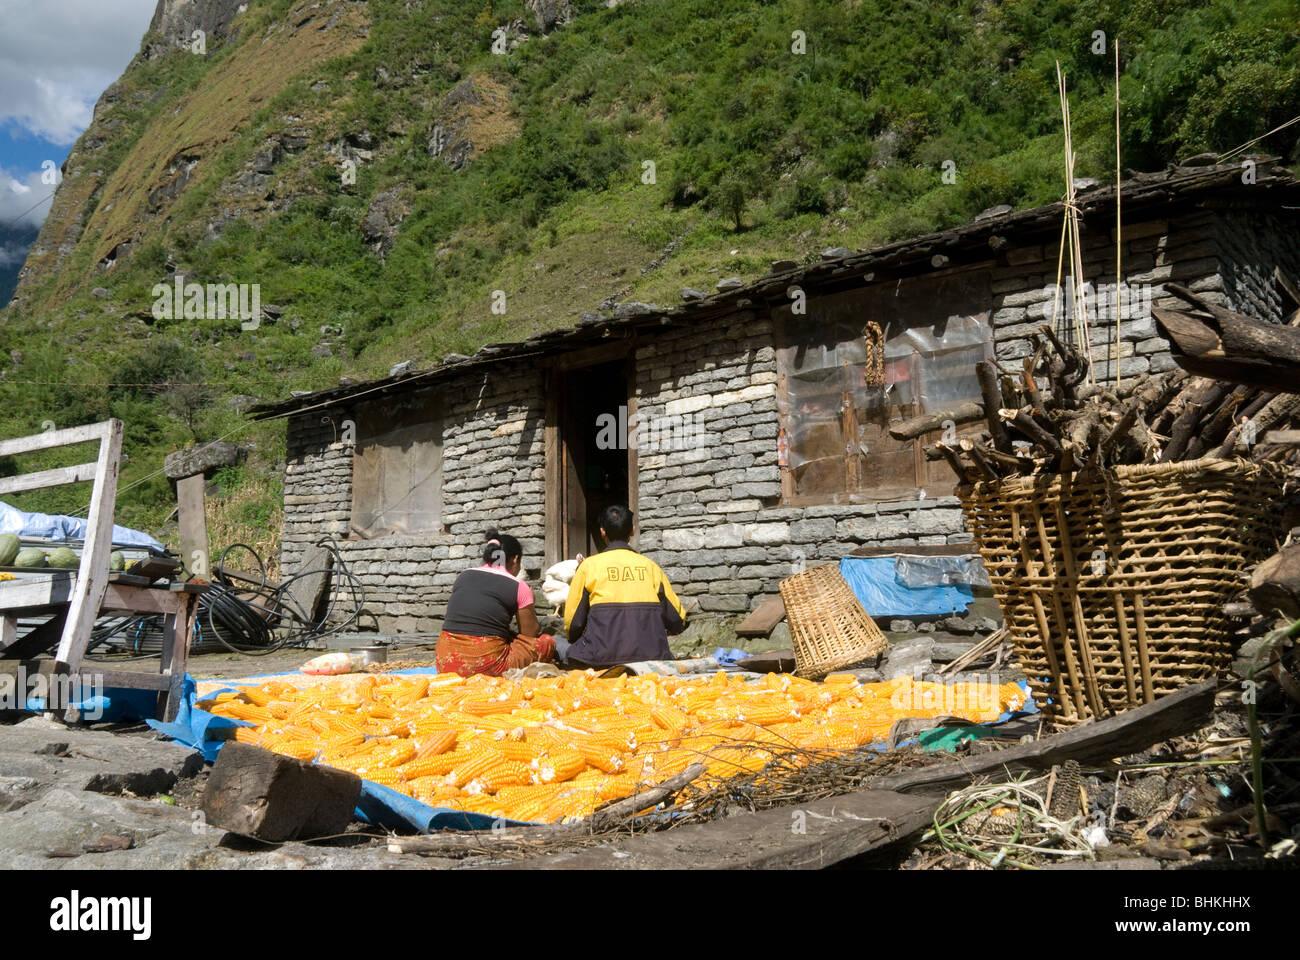 Corn cobs sun drying, Karte village, Annapurna Circuit, Nepal - Stock Image